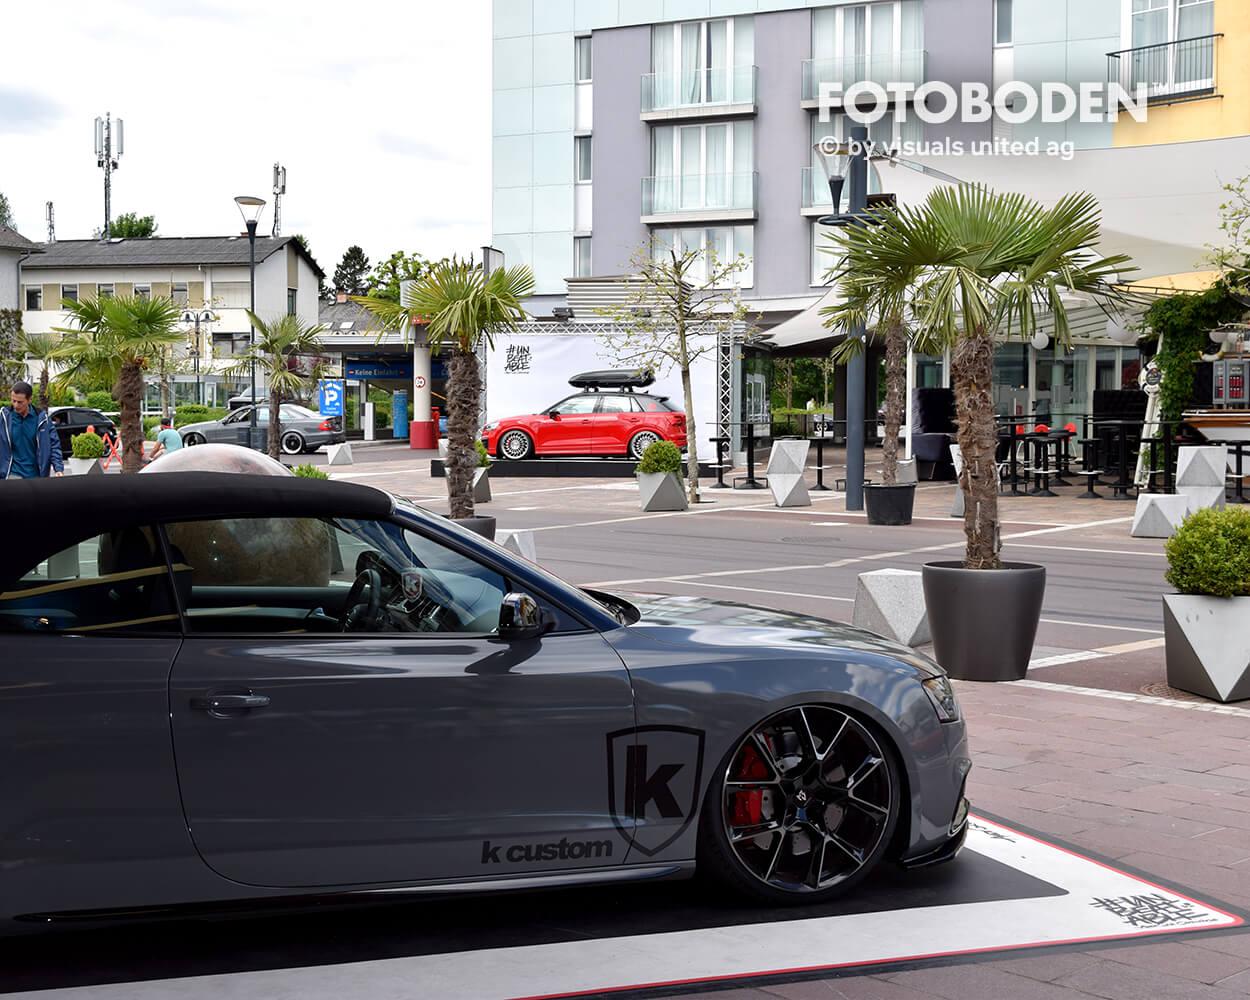 Audi Fotoboden Flooring Fußboden Bodengestaltung Floorminder Bodendruck Werbung Fußbodenwerbung Bodenwerbung Merchandising Advertising Visualmerchandising 4